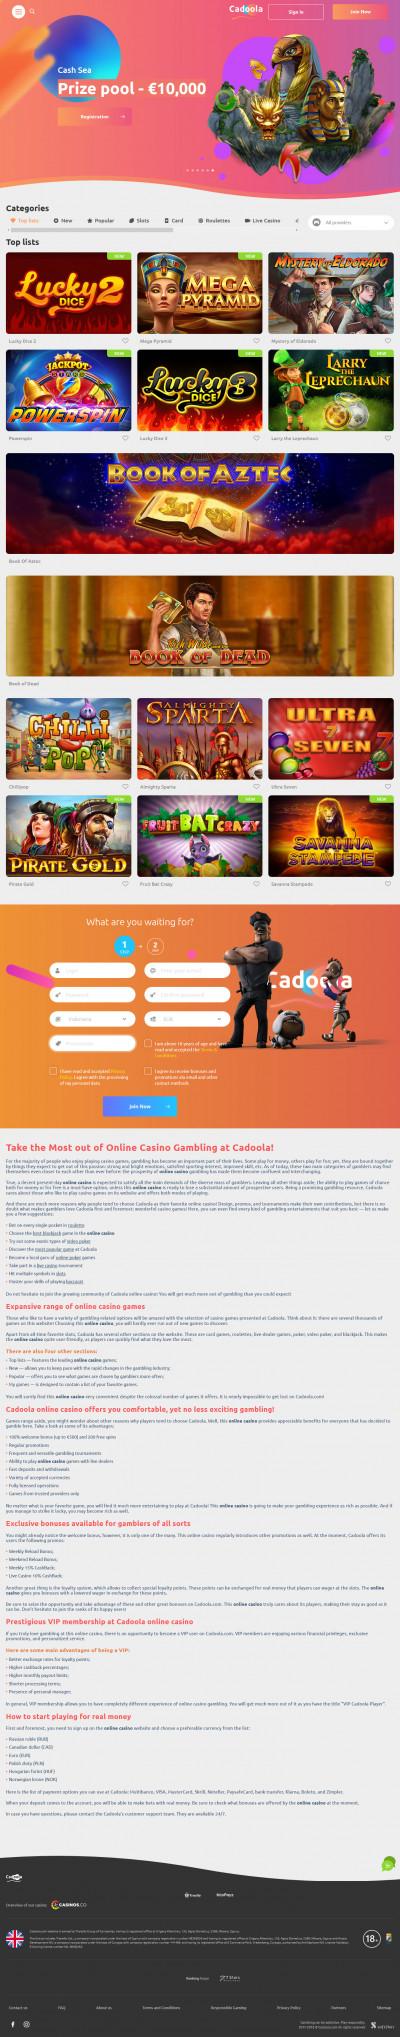 Cadoola Casino Screenshot